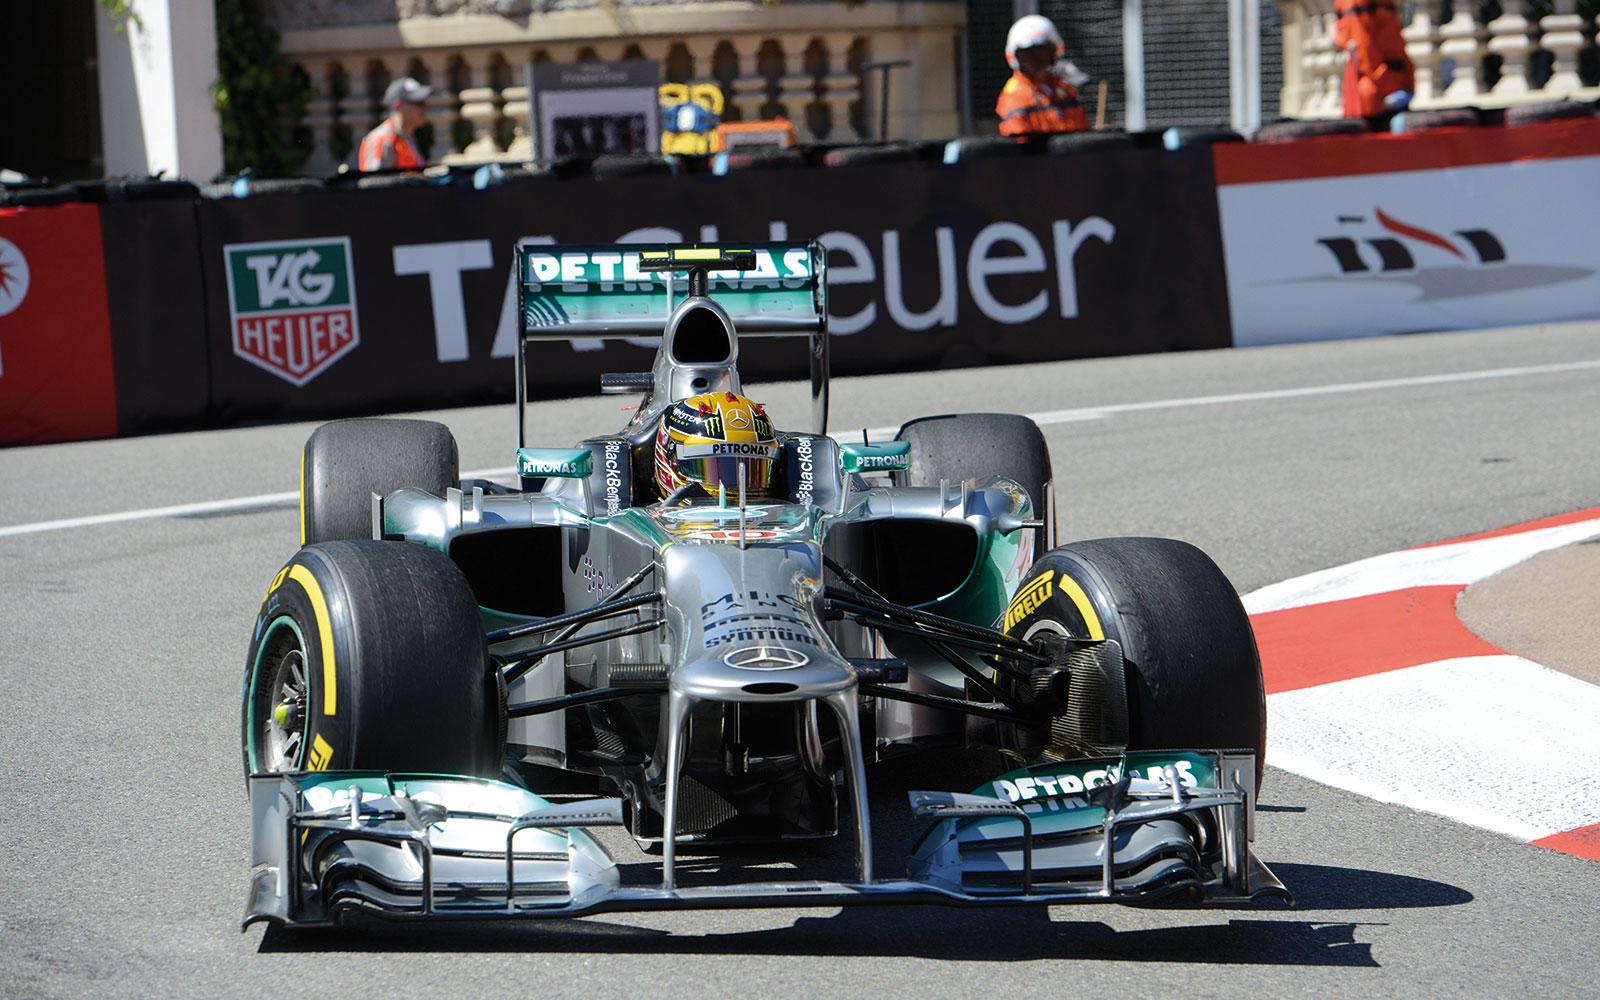 GP-F1-2013-Lewis-Hamilton-Virage-Fairmont